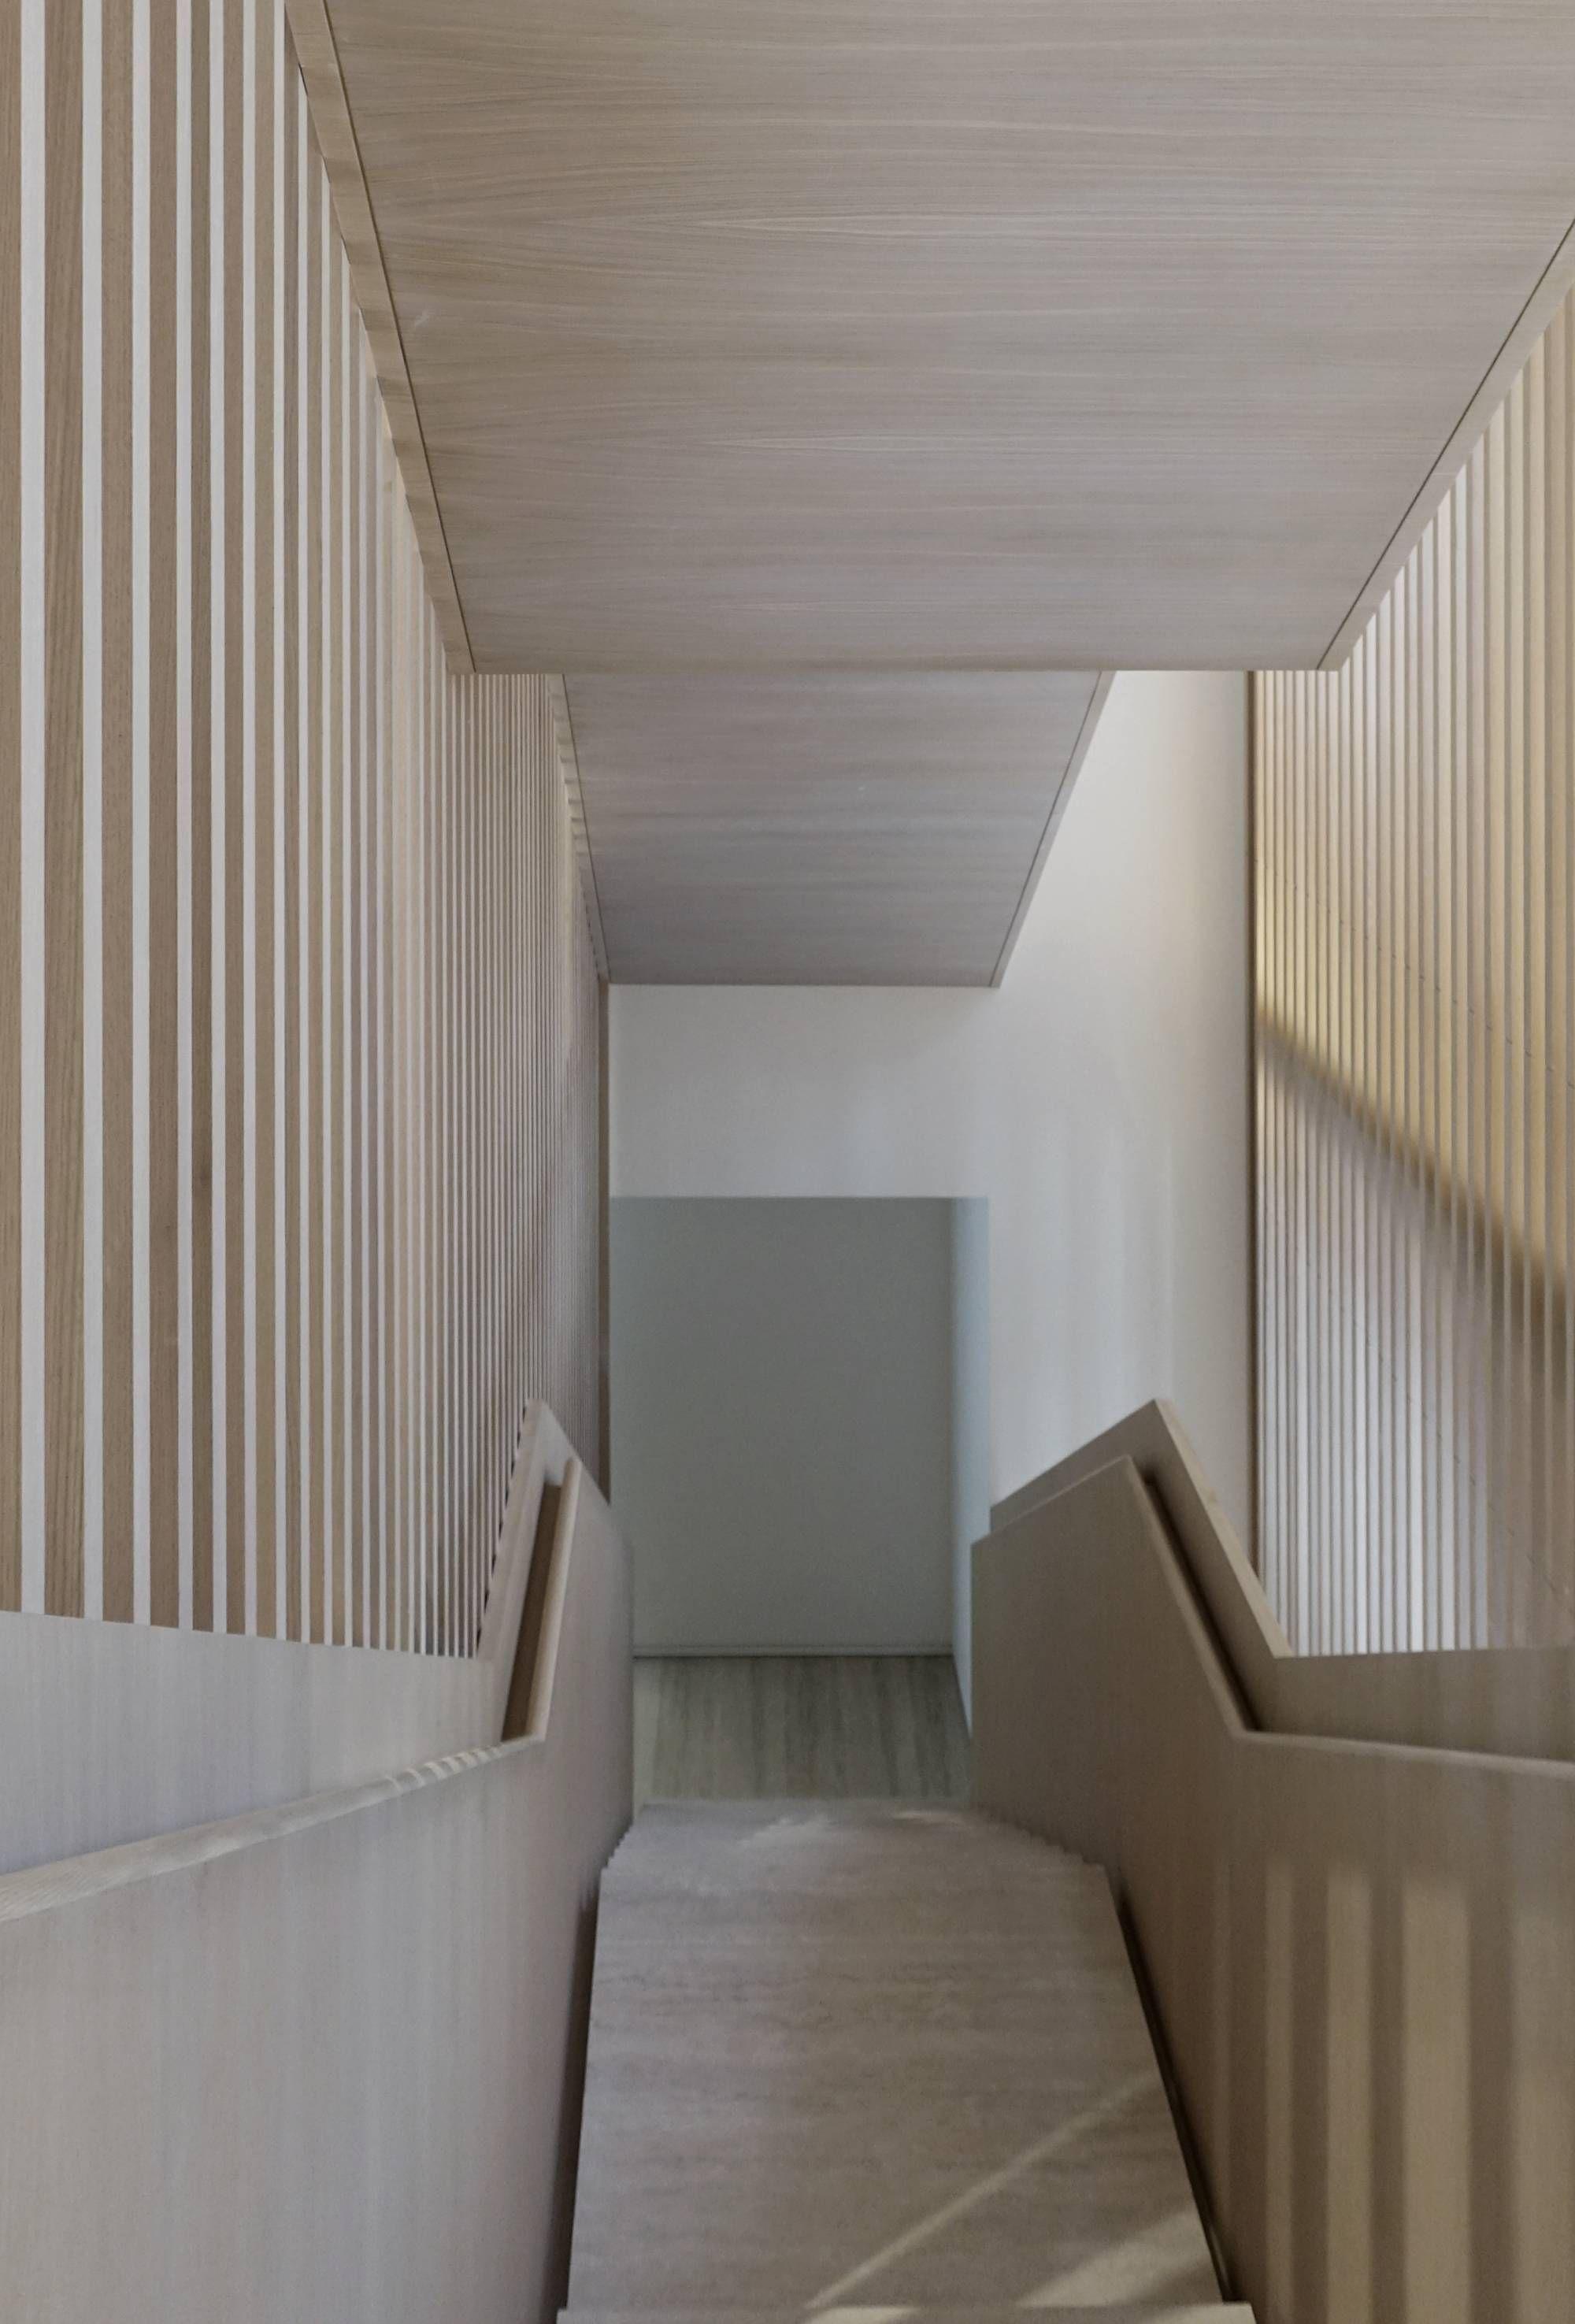 Pin de Santiago Hinojos en Stairs   Pinterest   Interiores